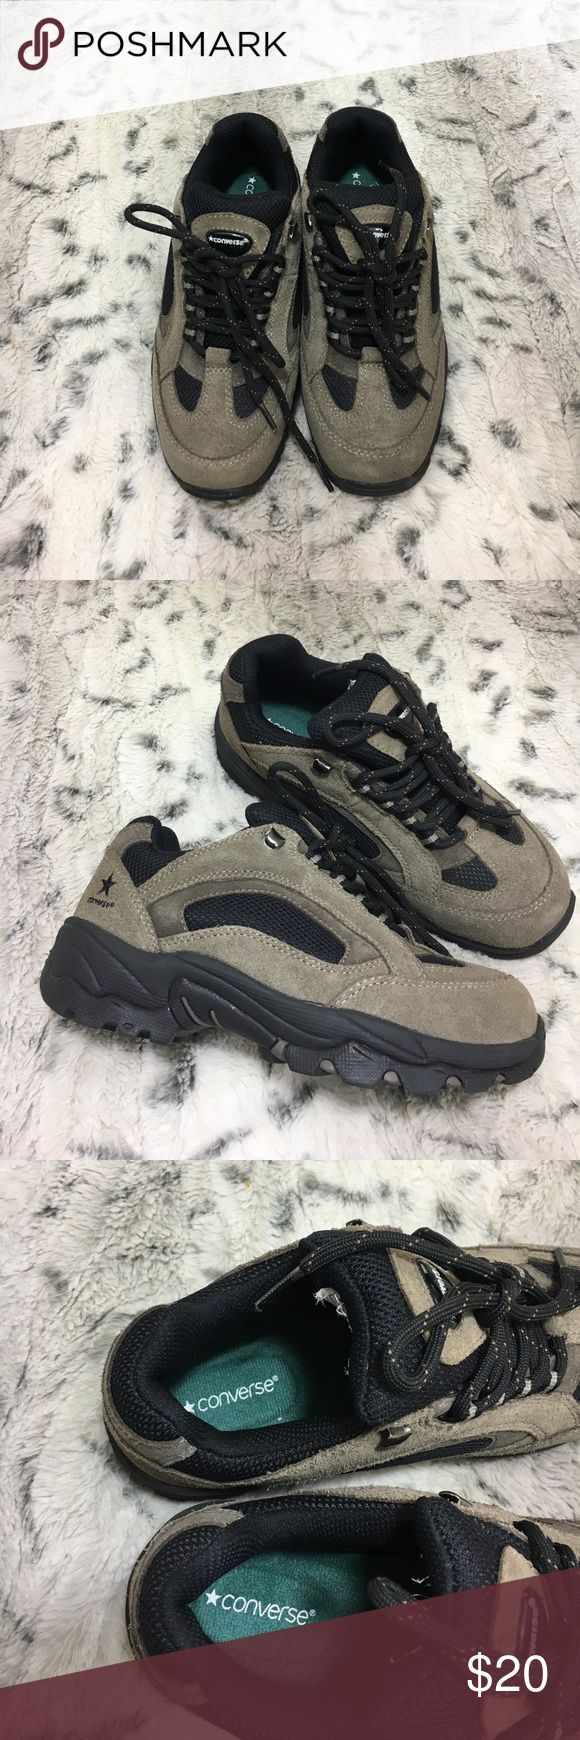 Hiking converse shoes men's 5 women's 7 Brown black suede hiking shoes Converse Shoes Sneakers